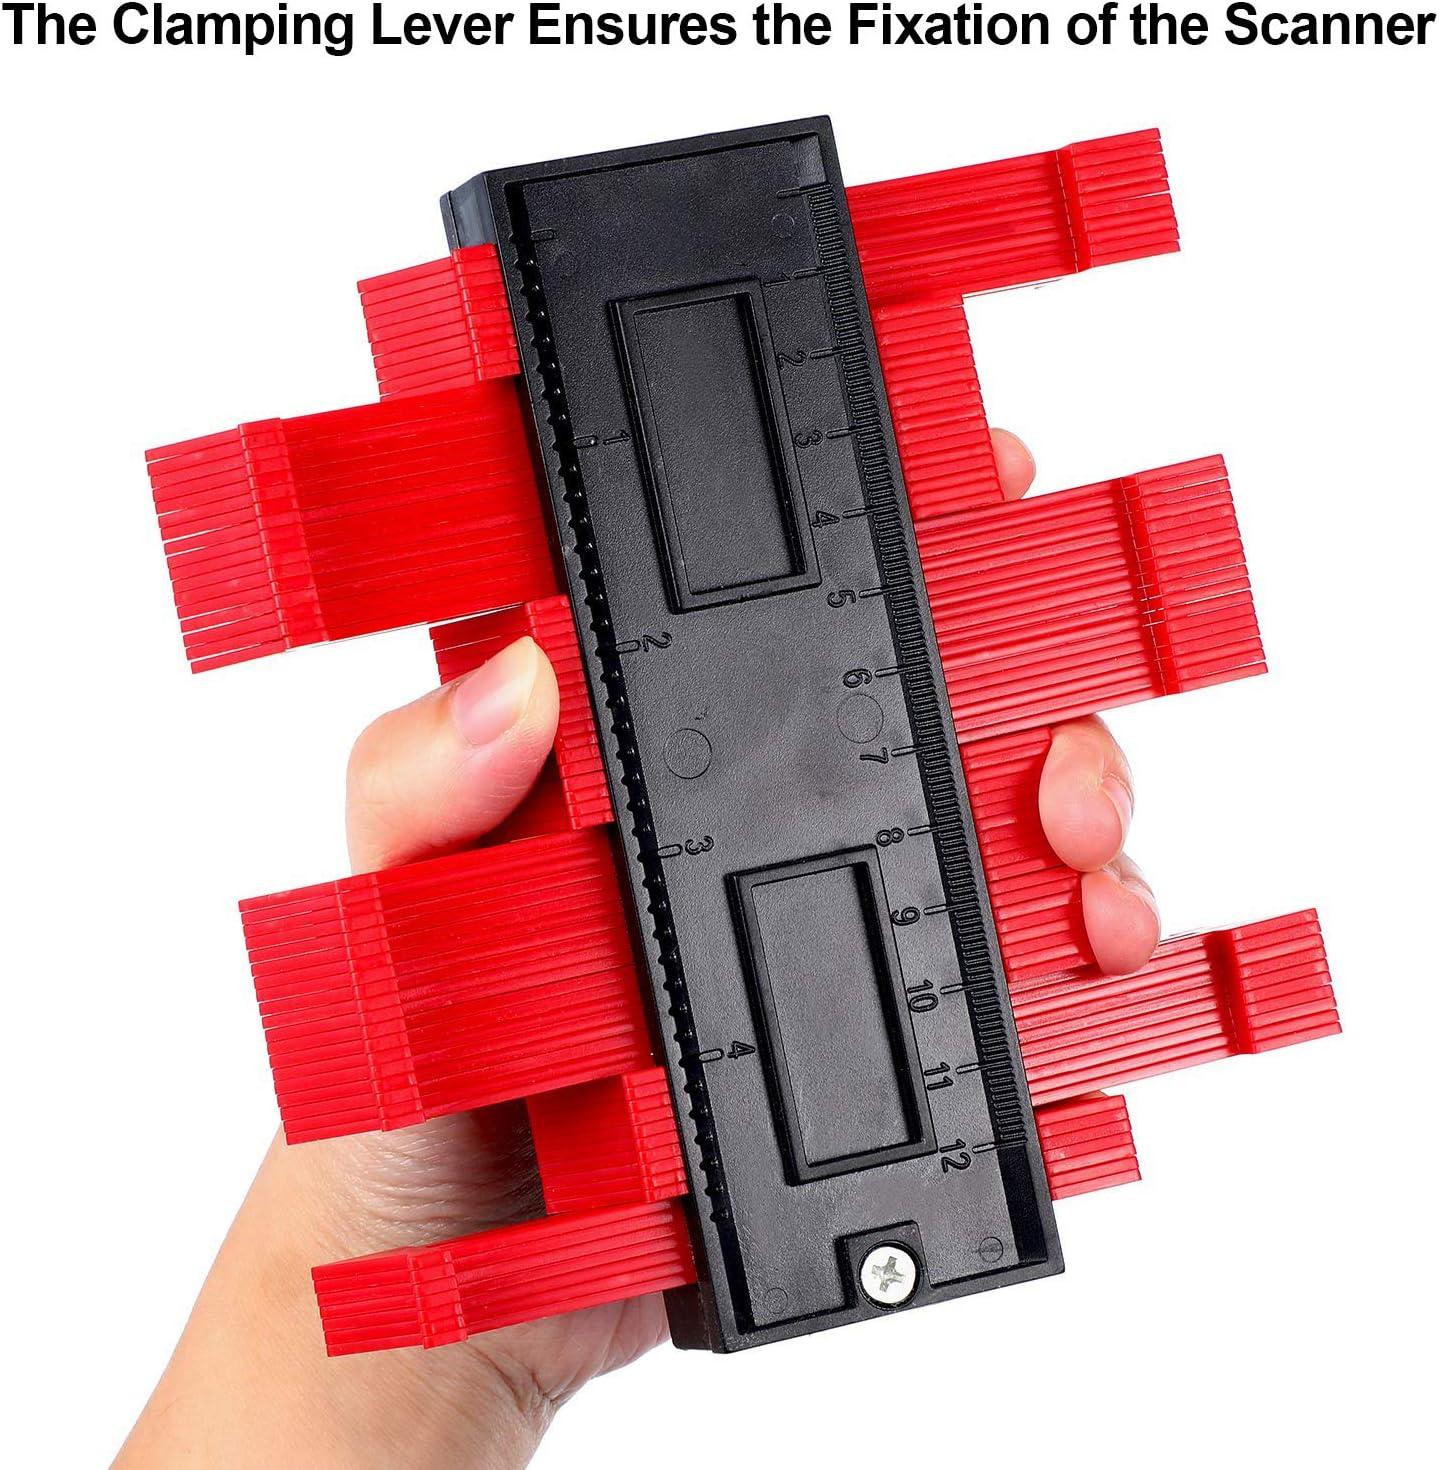 Contour Gauge Duplicator Willingood Profile Measuring Tool Plastic Woodworking Shape Tracing Template Contour Copy Duplicator Circular Frame Profile Gauge Ruled 5 inch